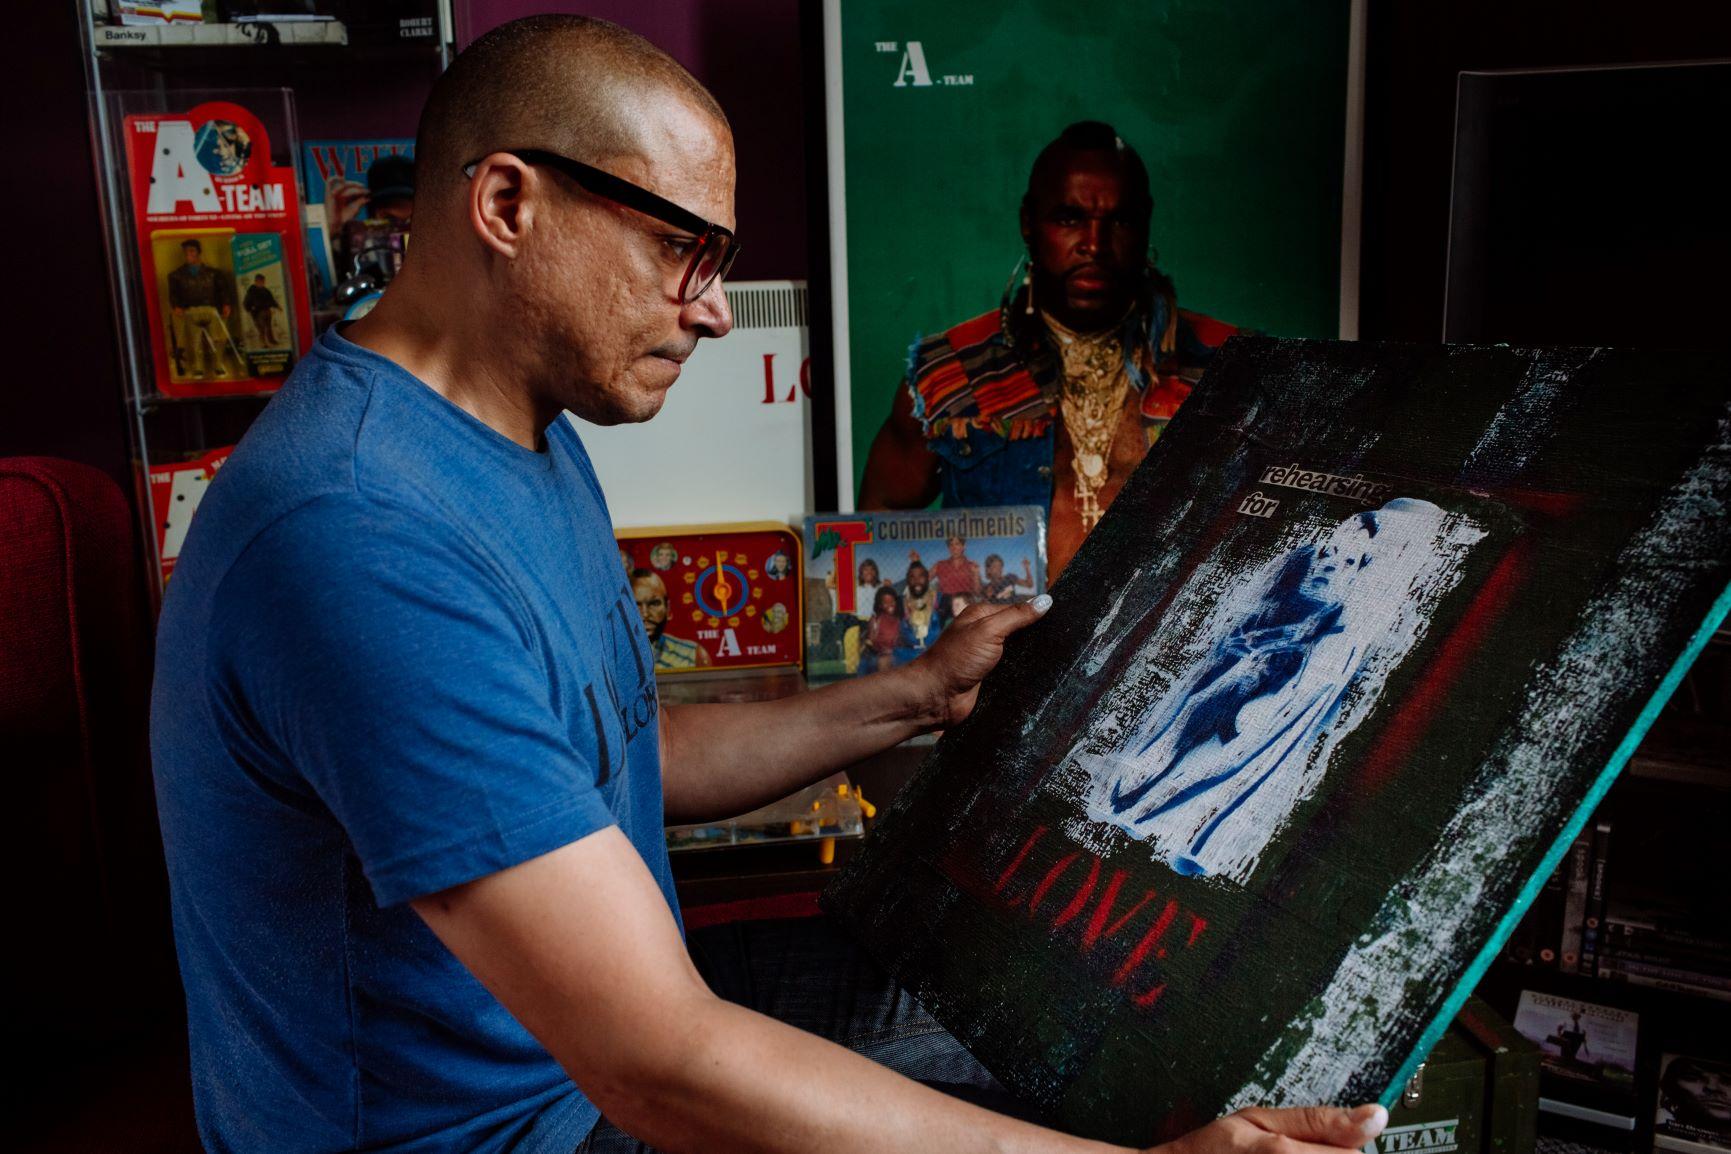 Image of Jason Wheeler with his artwork